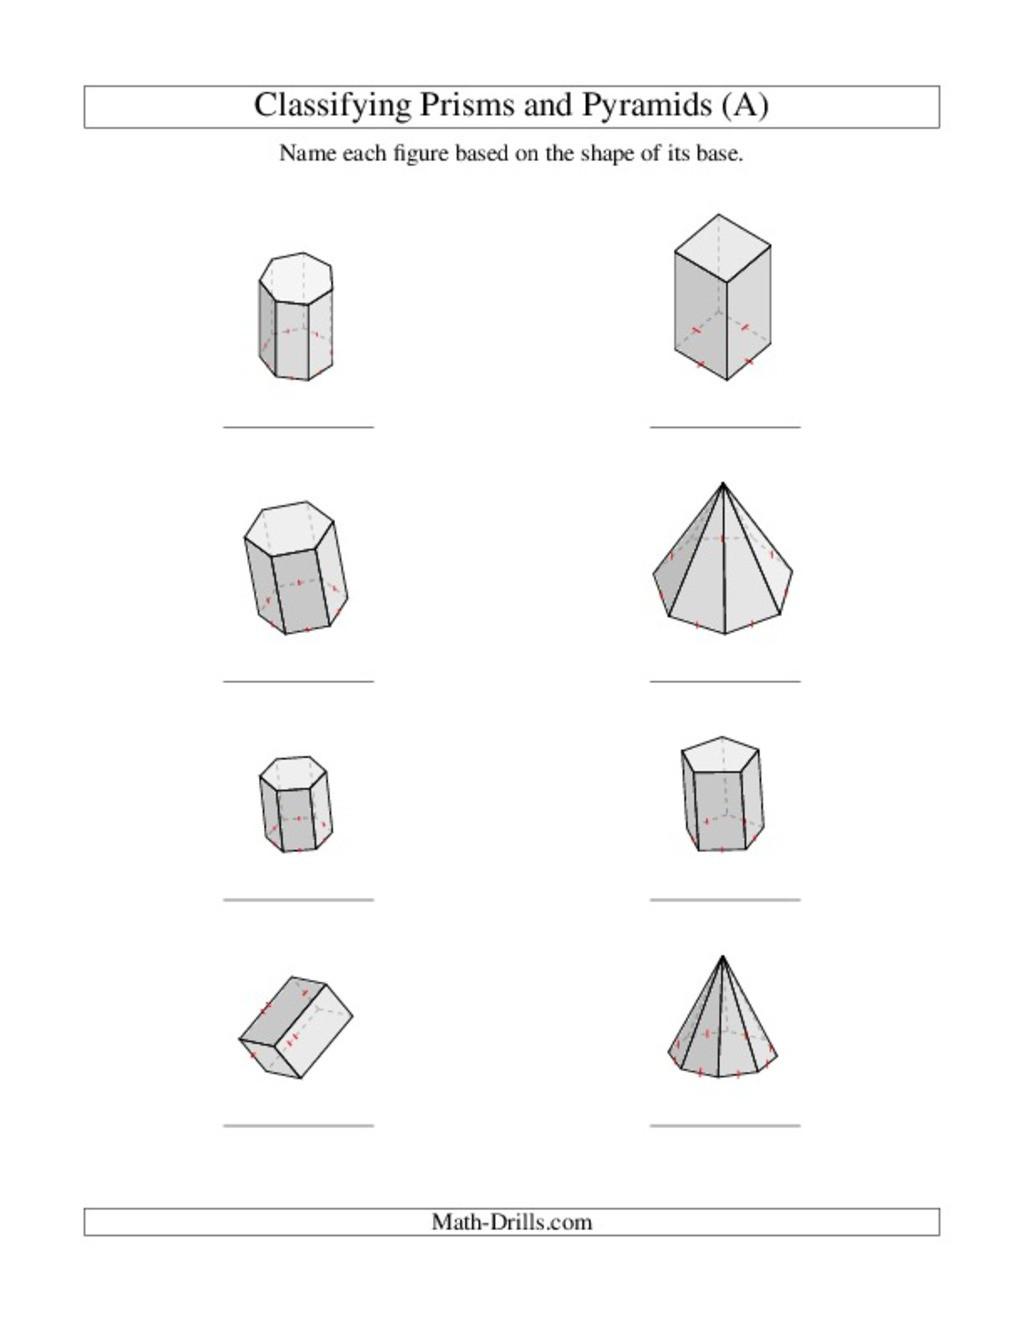 Cross Section Worksheet 7th Grade solid Figures Lesson Plans & Worksheets